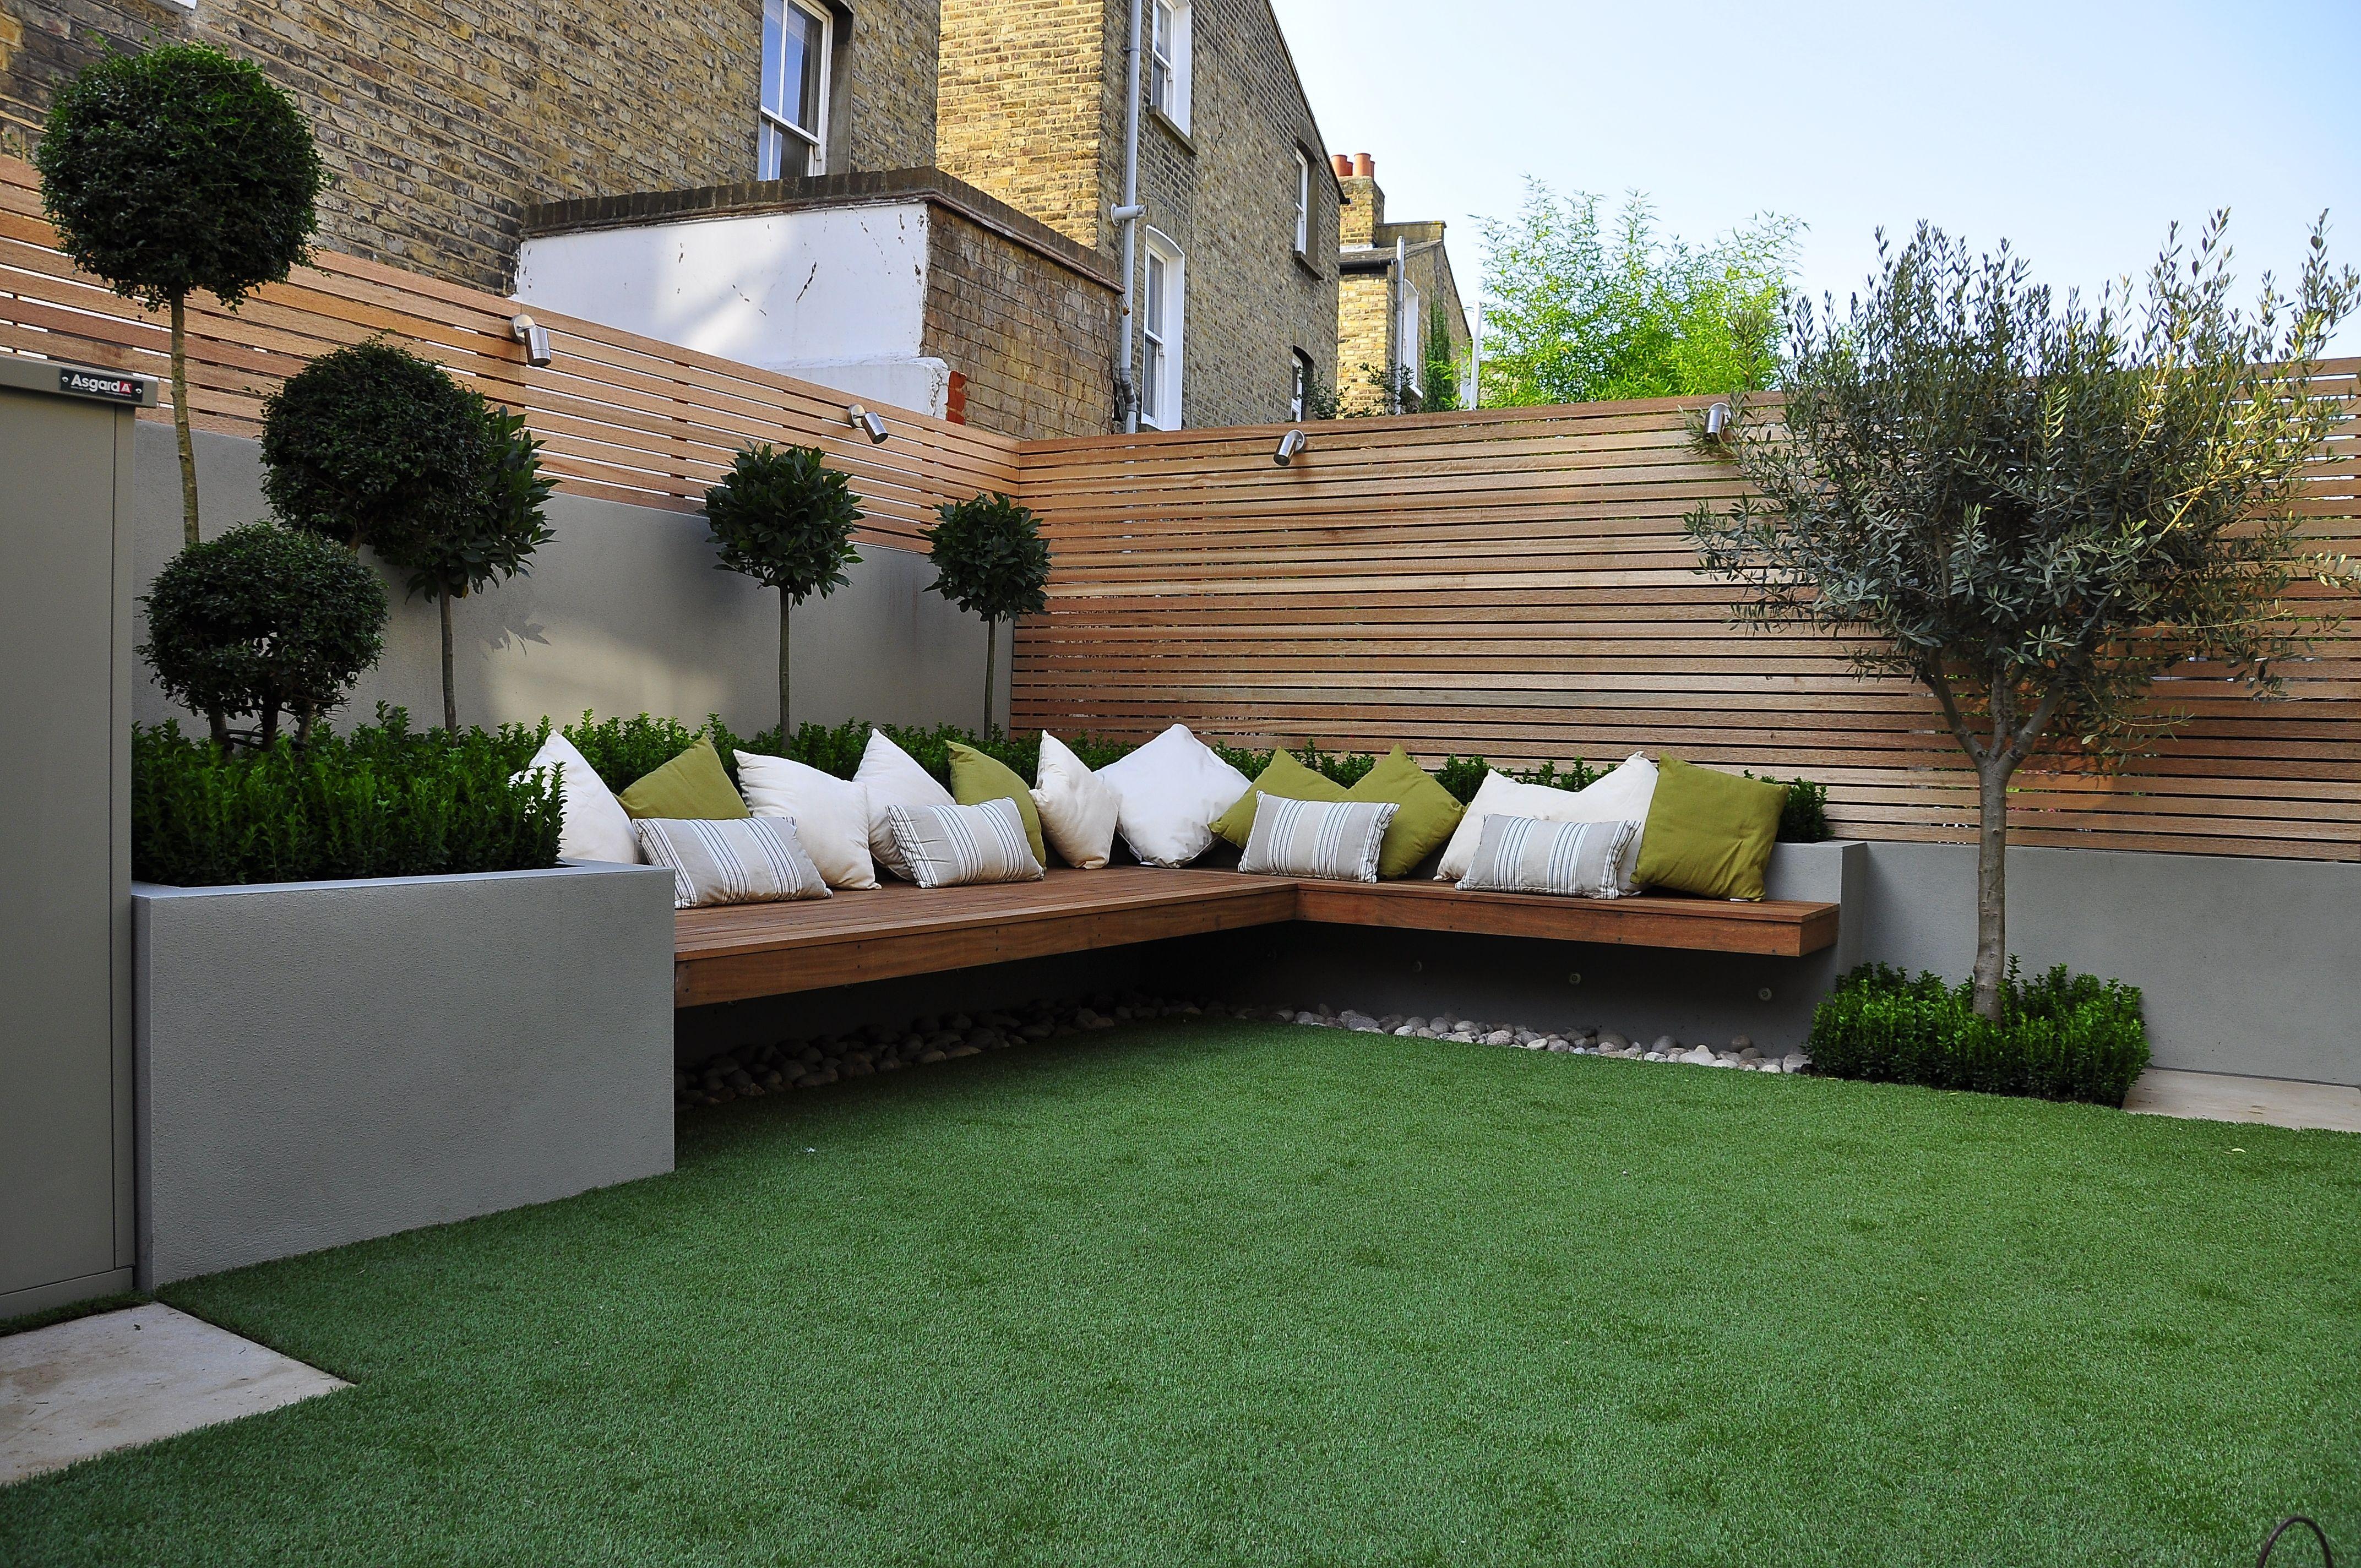 28 Backyard Seating Ideas | Modern garden design, Small ... on Back Garden Seating Area Ideas id=53281